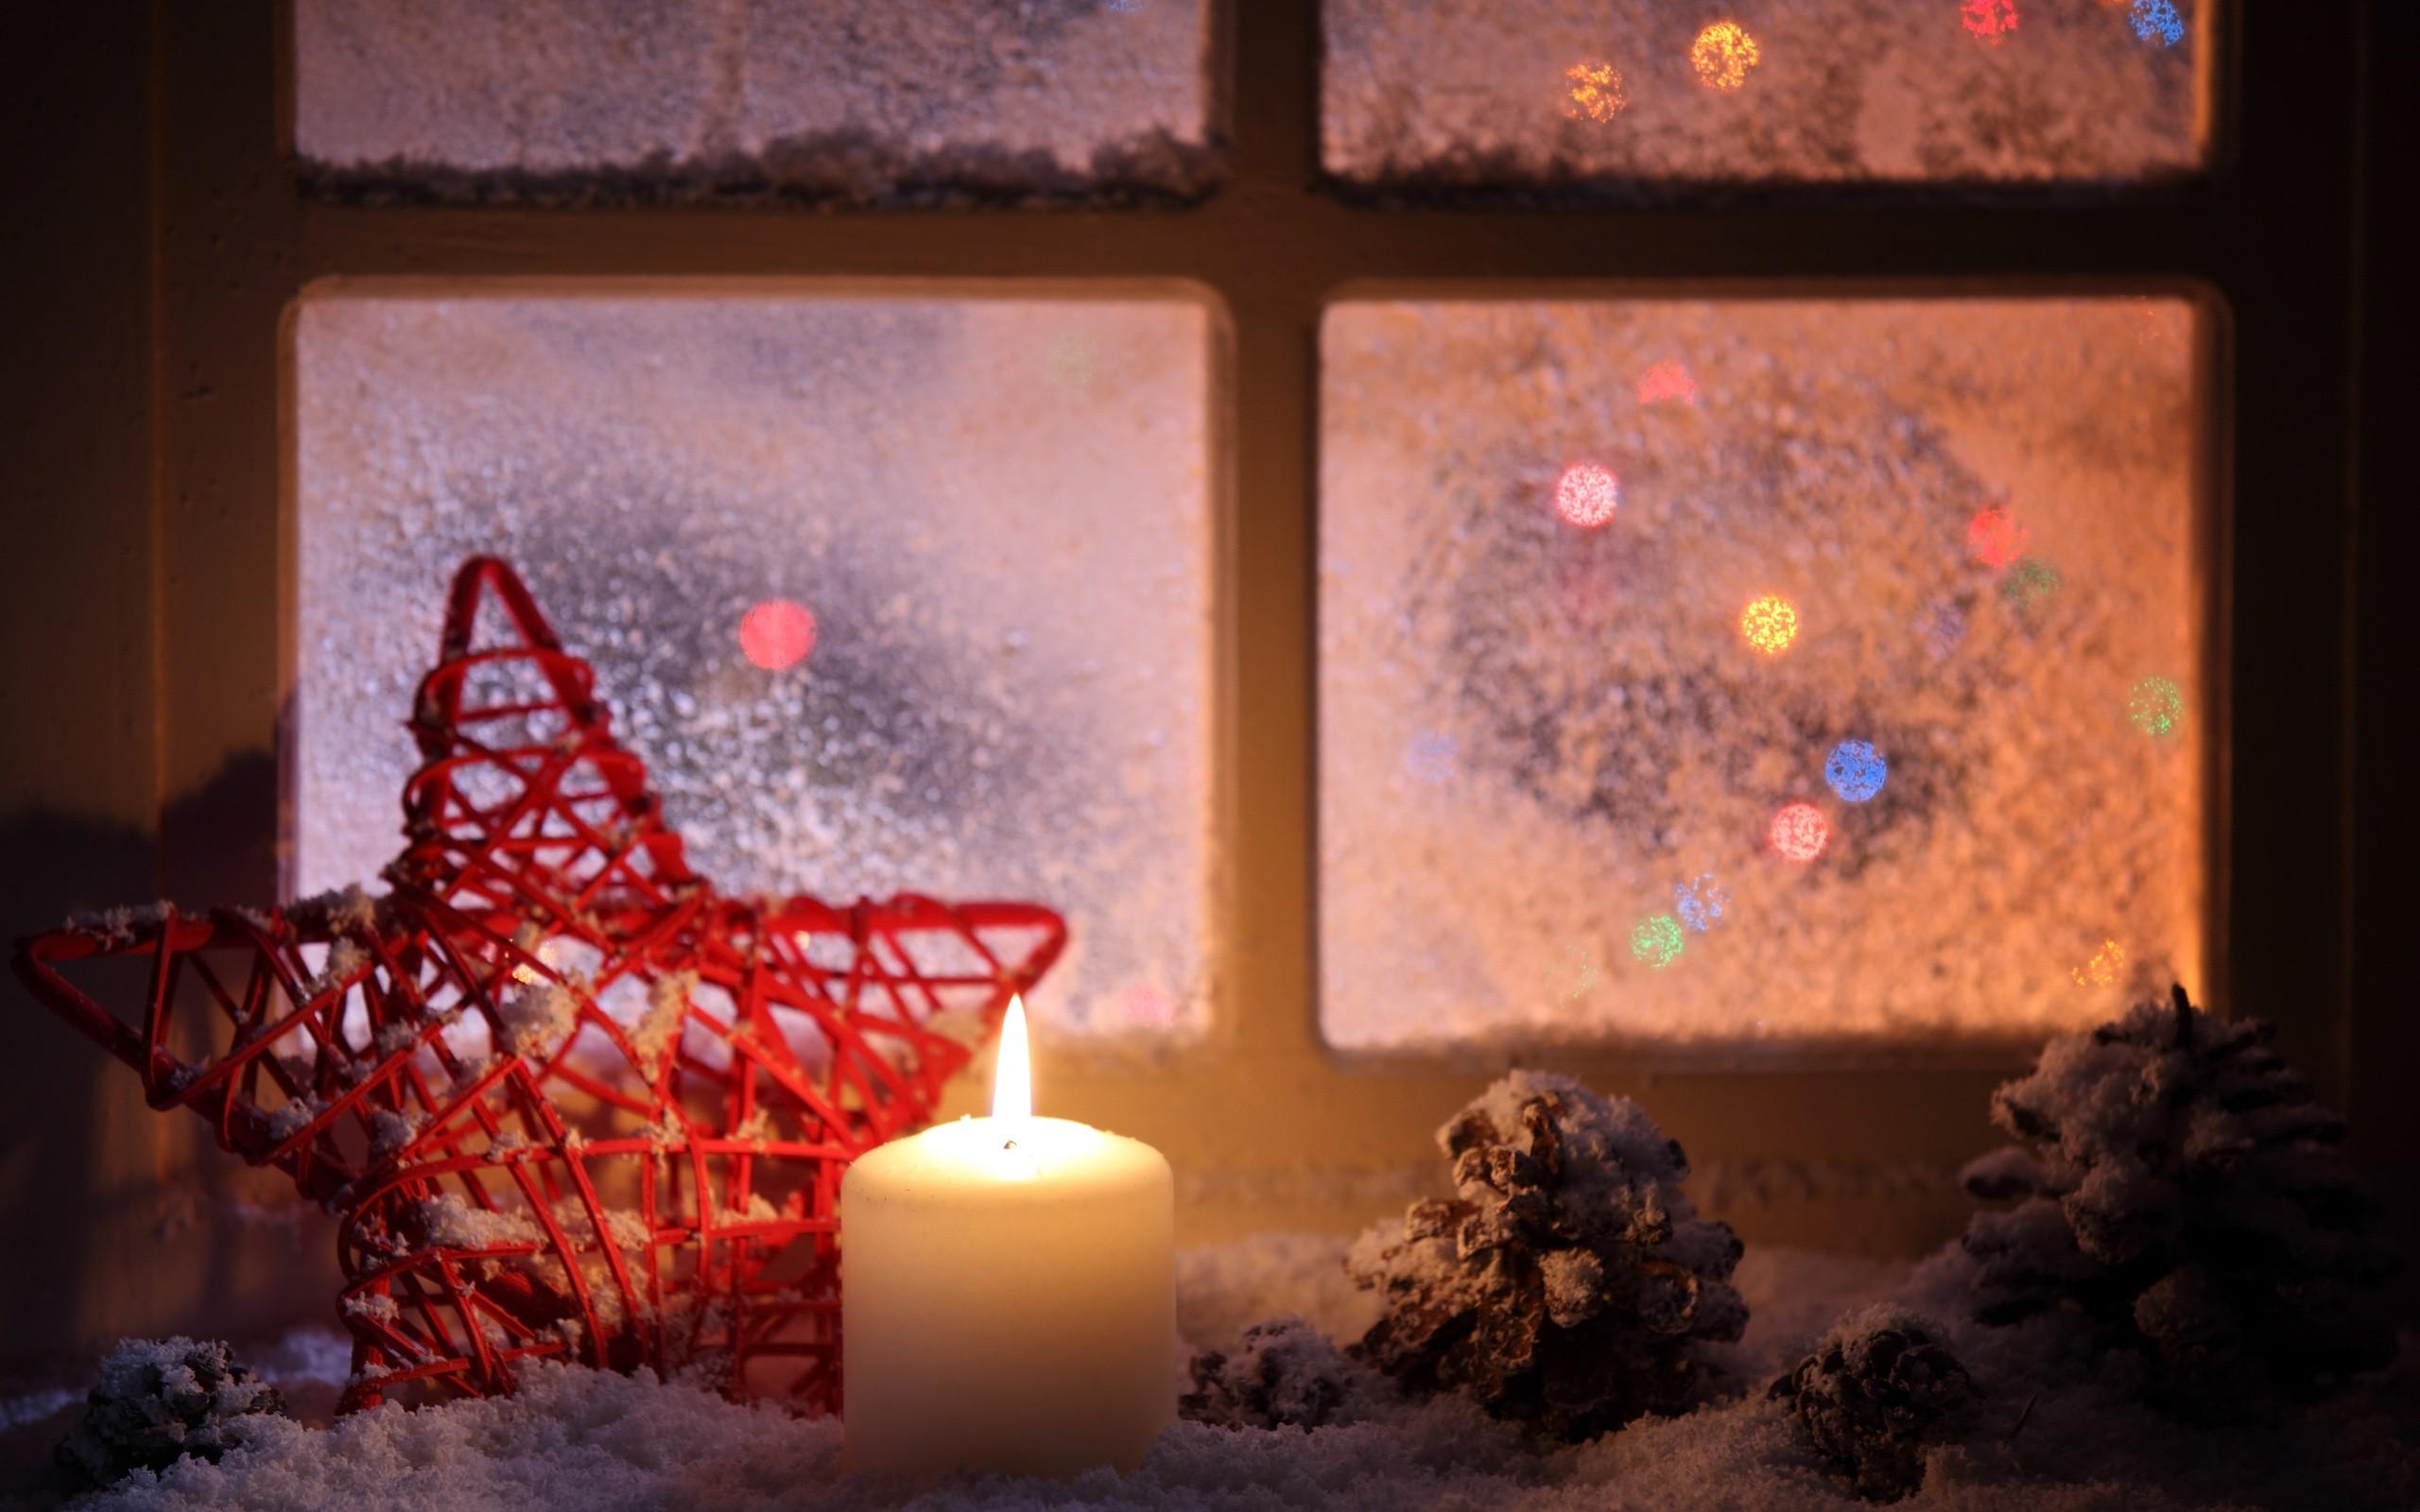 Vela junto a la ventana en navidad - 2560x1600